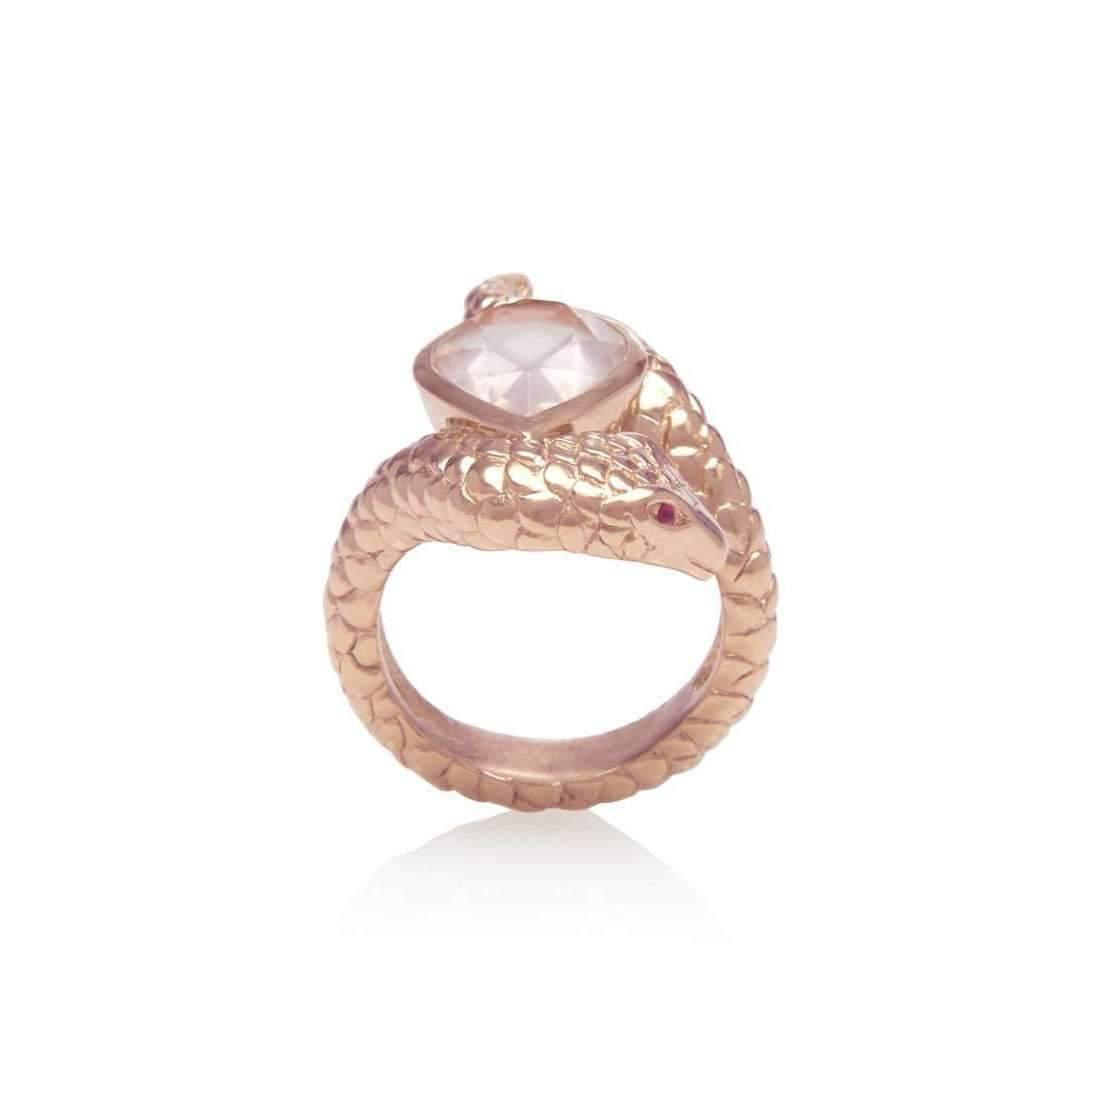 Alexandra Alberta Heliconia Chalcedony Ring - UK L - US 5 1/2 - EU 51 3/4 c1pP5W